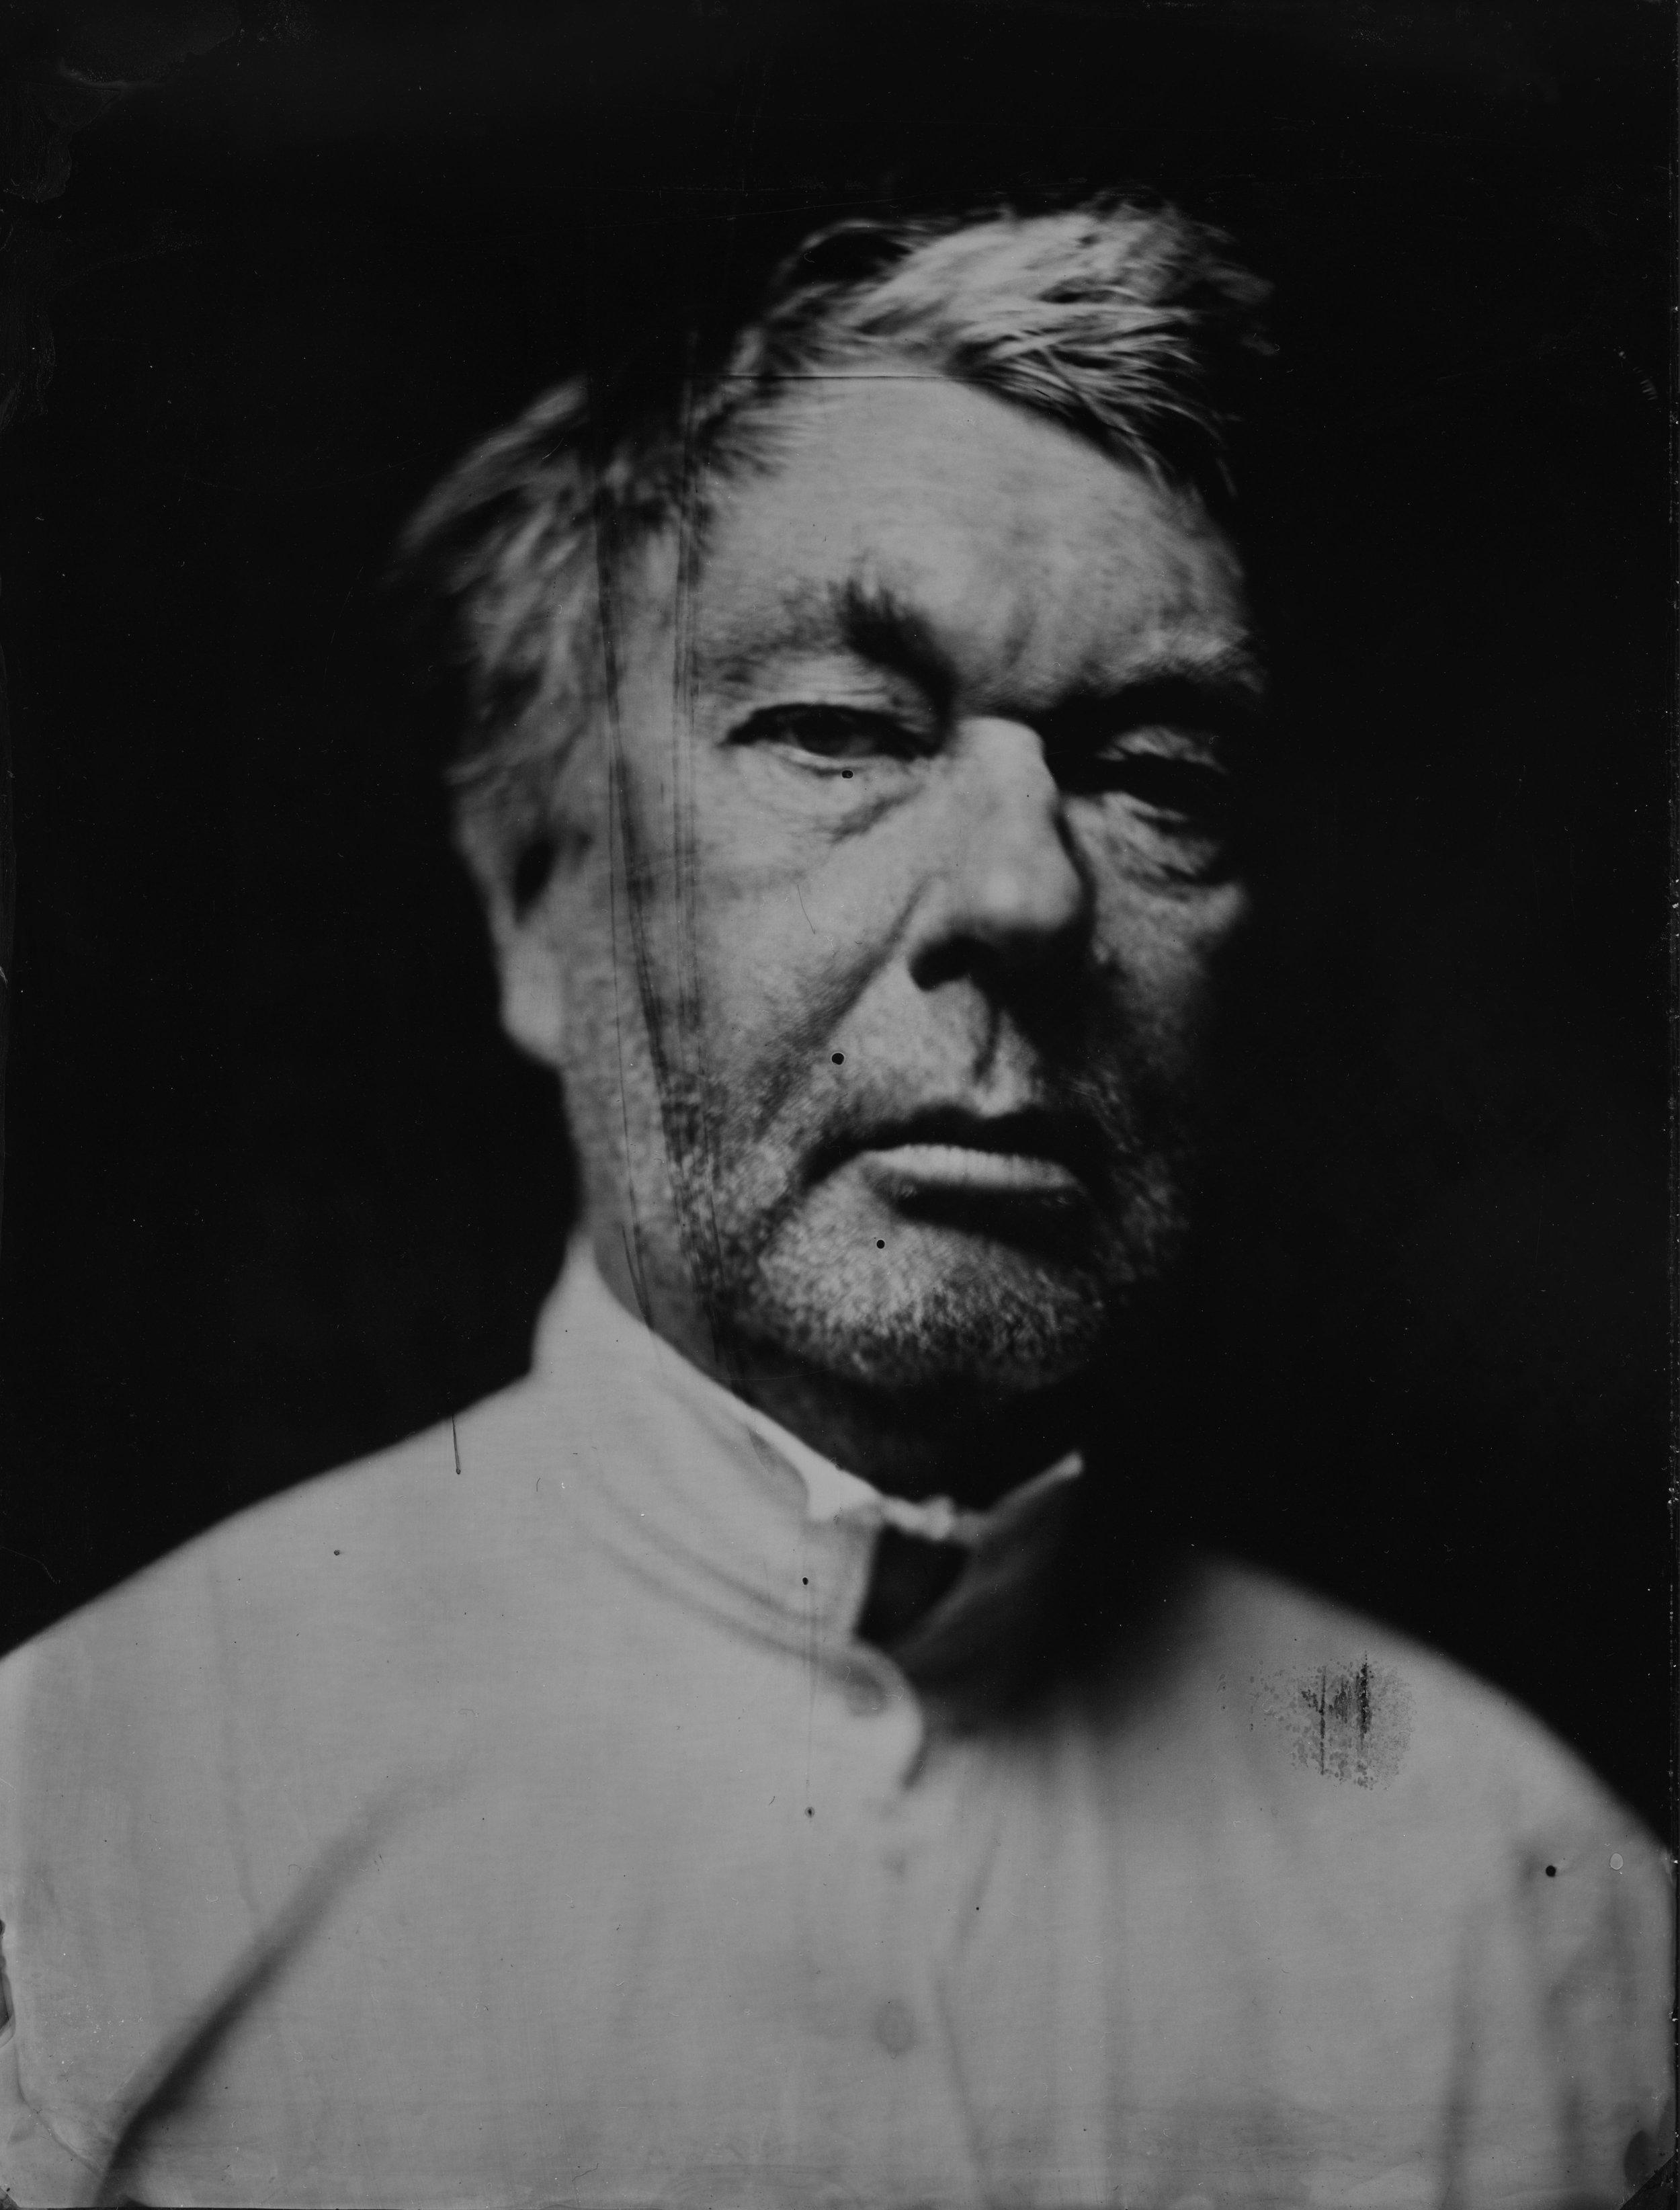 Paul M.Waschkau